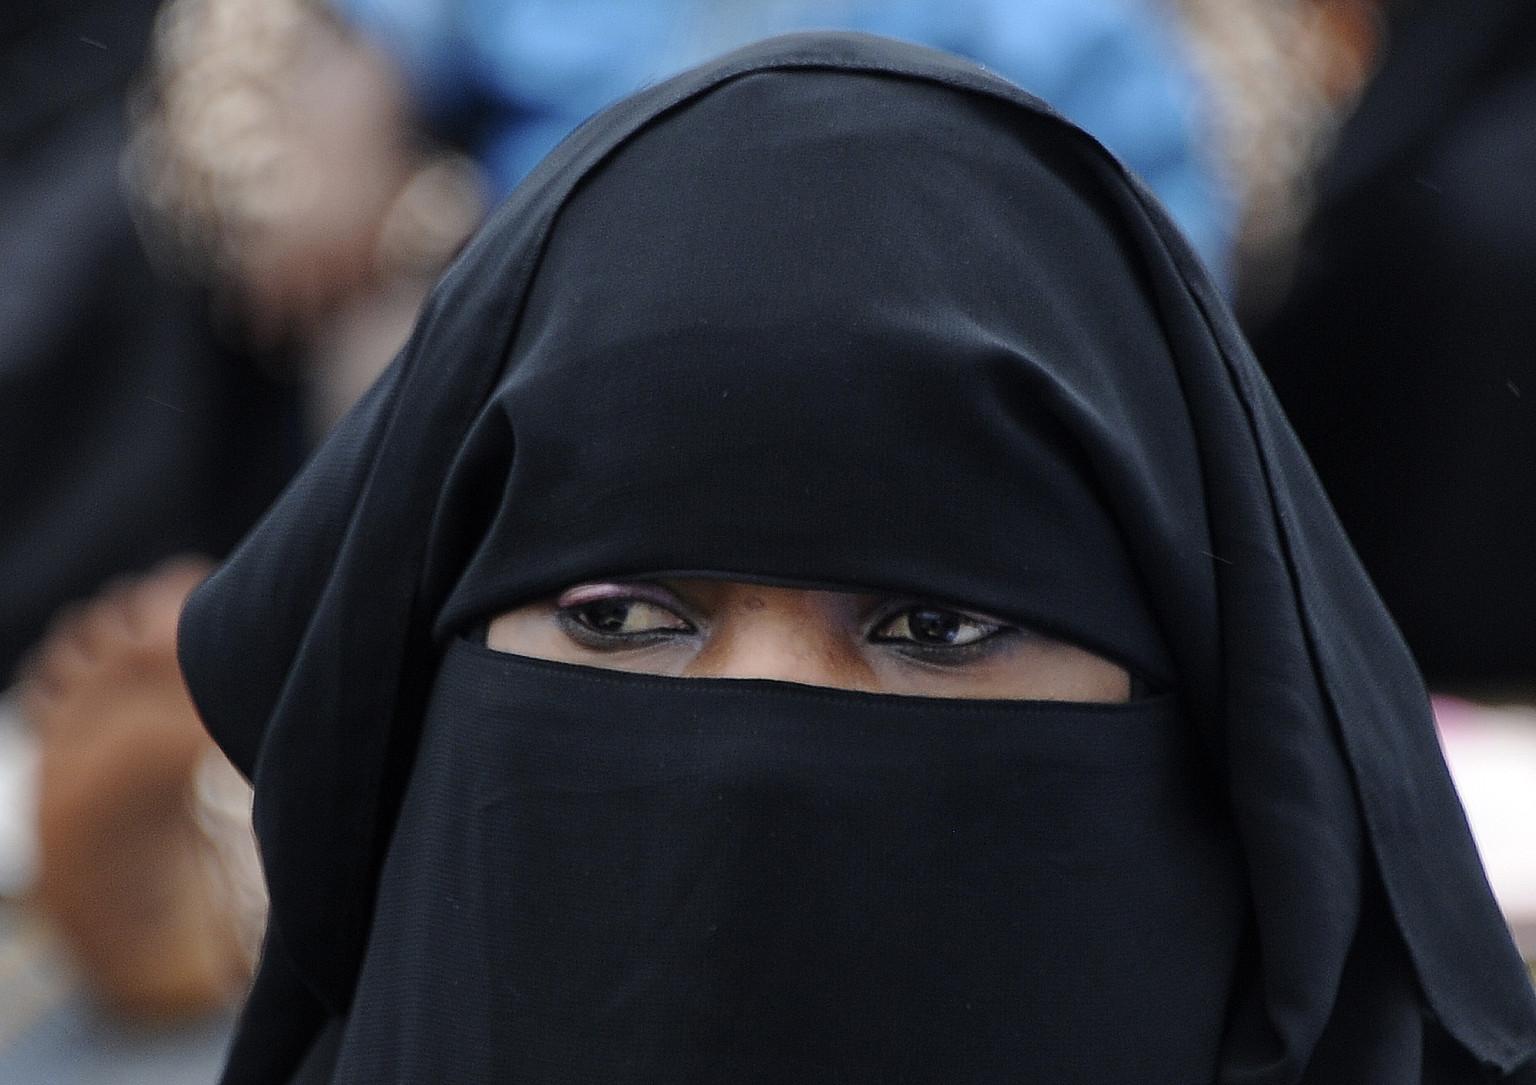 Should we ban the muslim veil?